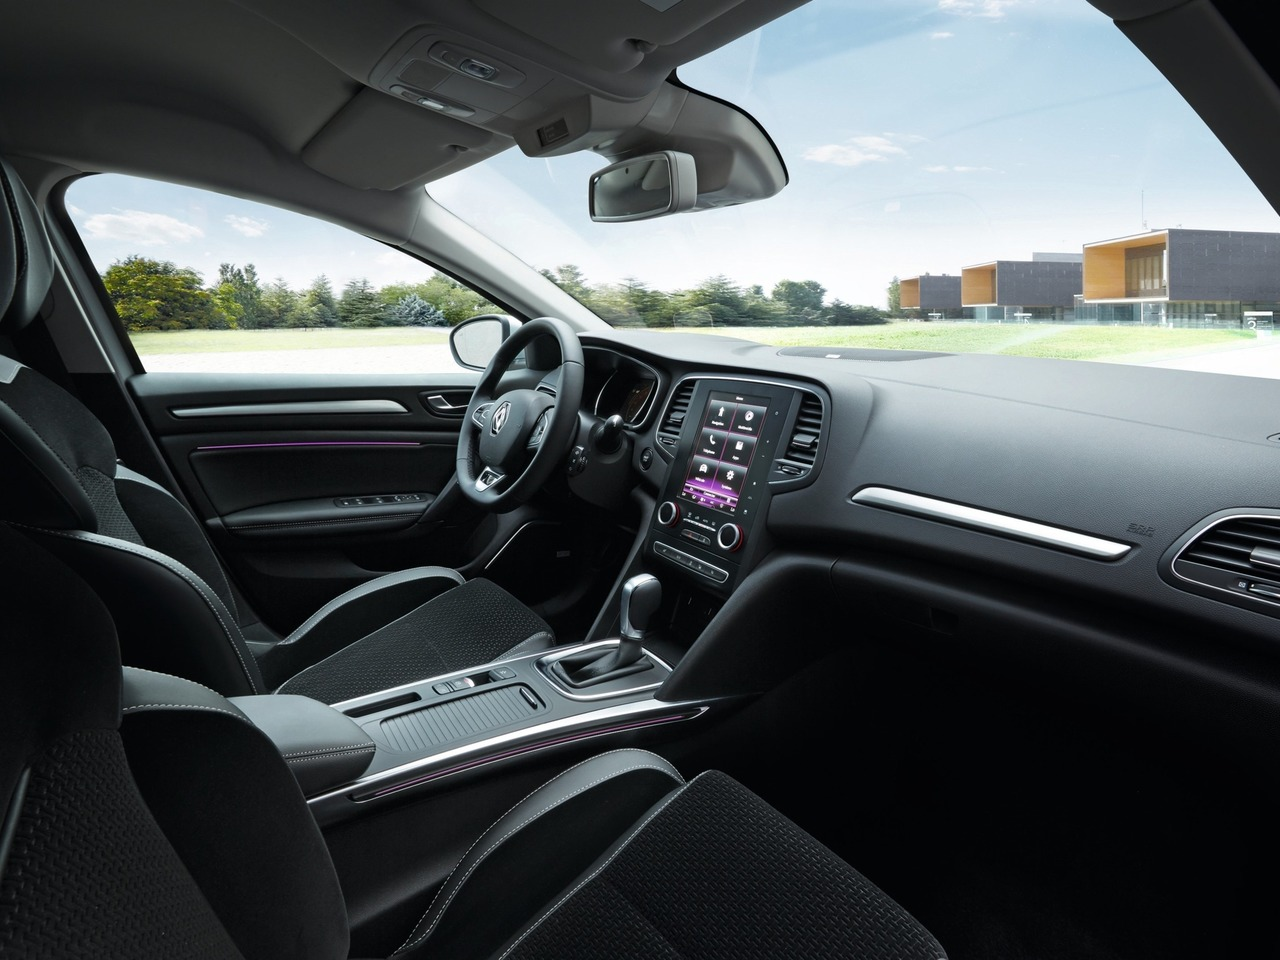 Снимки: Renault Megane 4